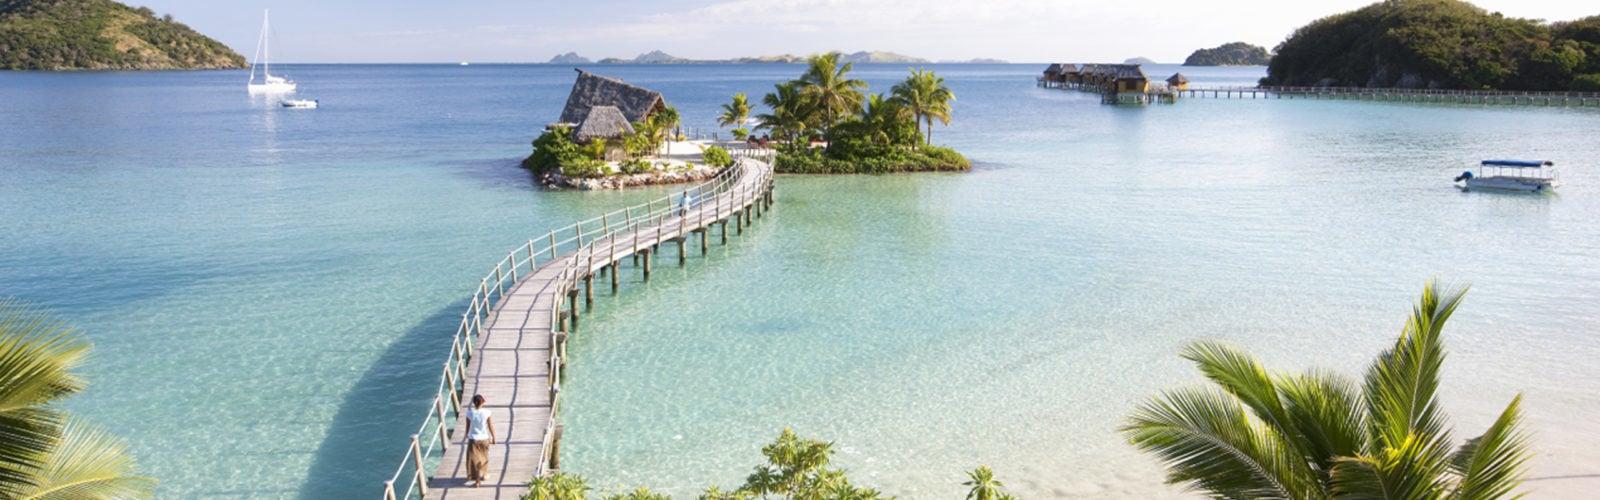 likuliku-over-water-villas